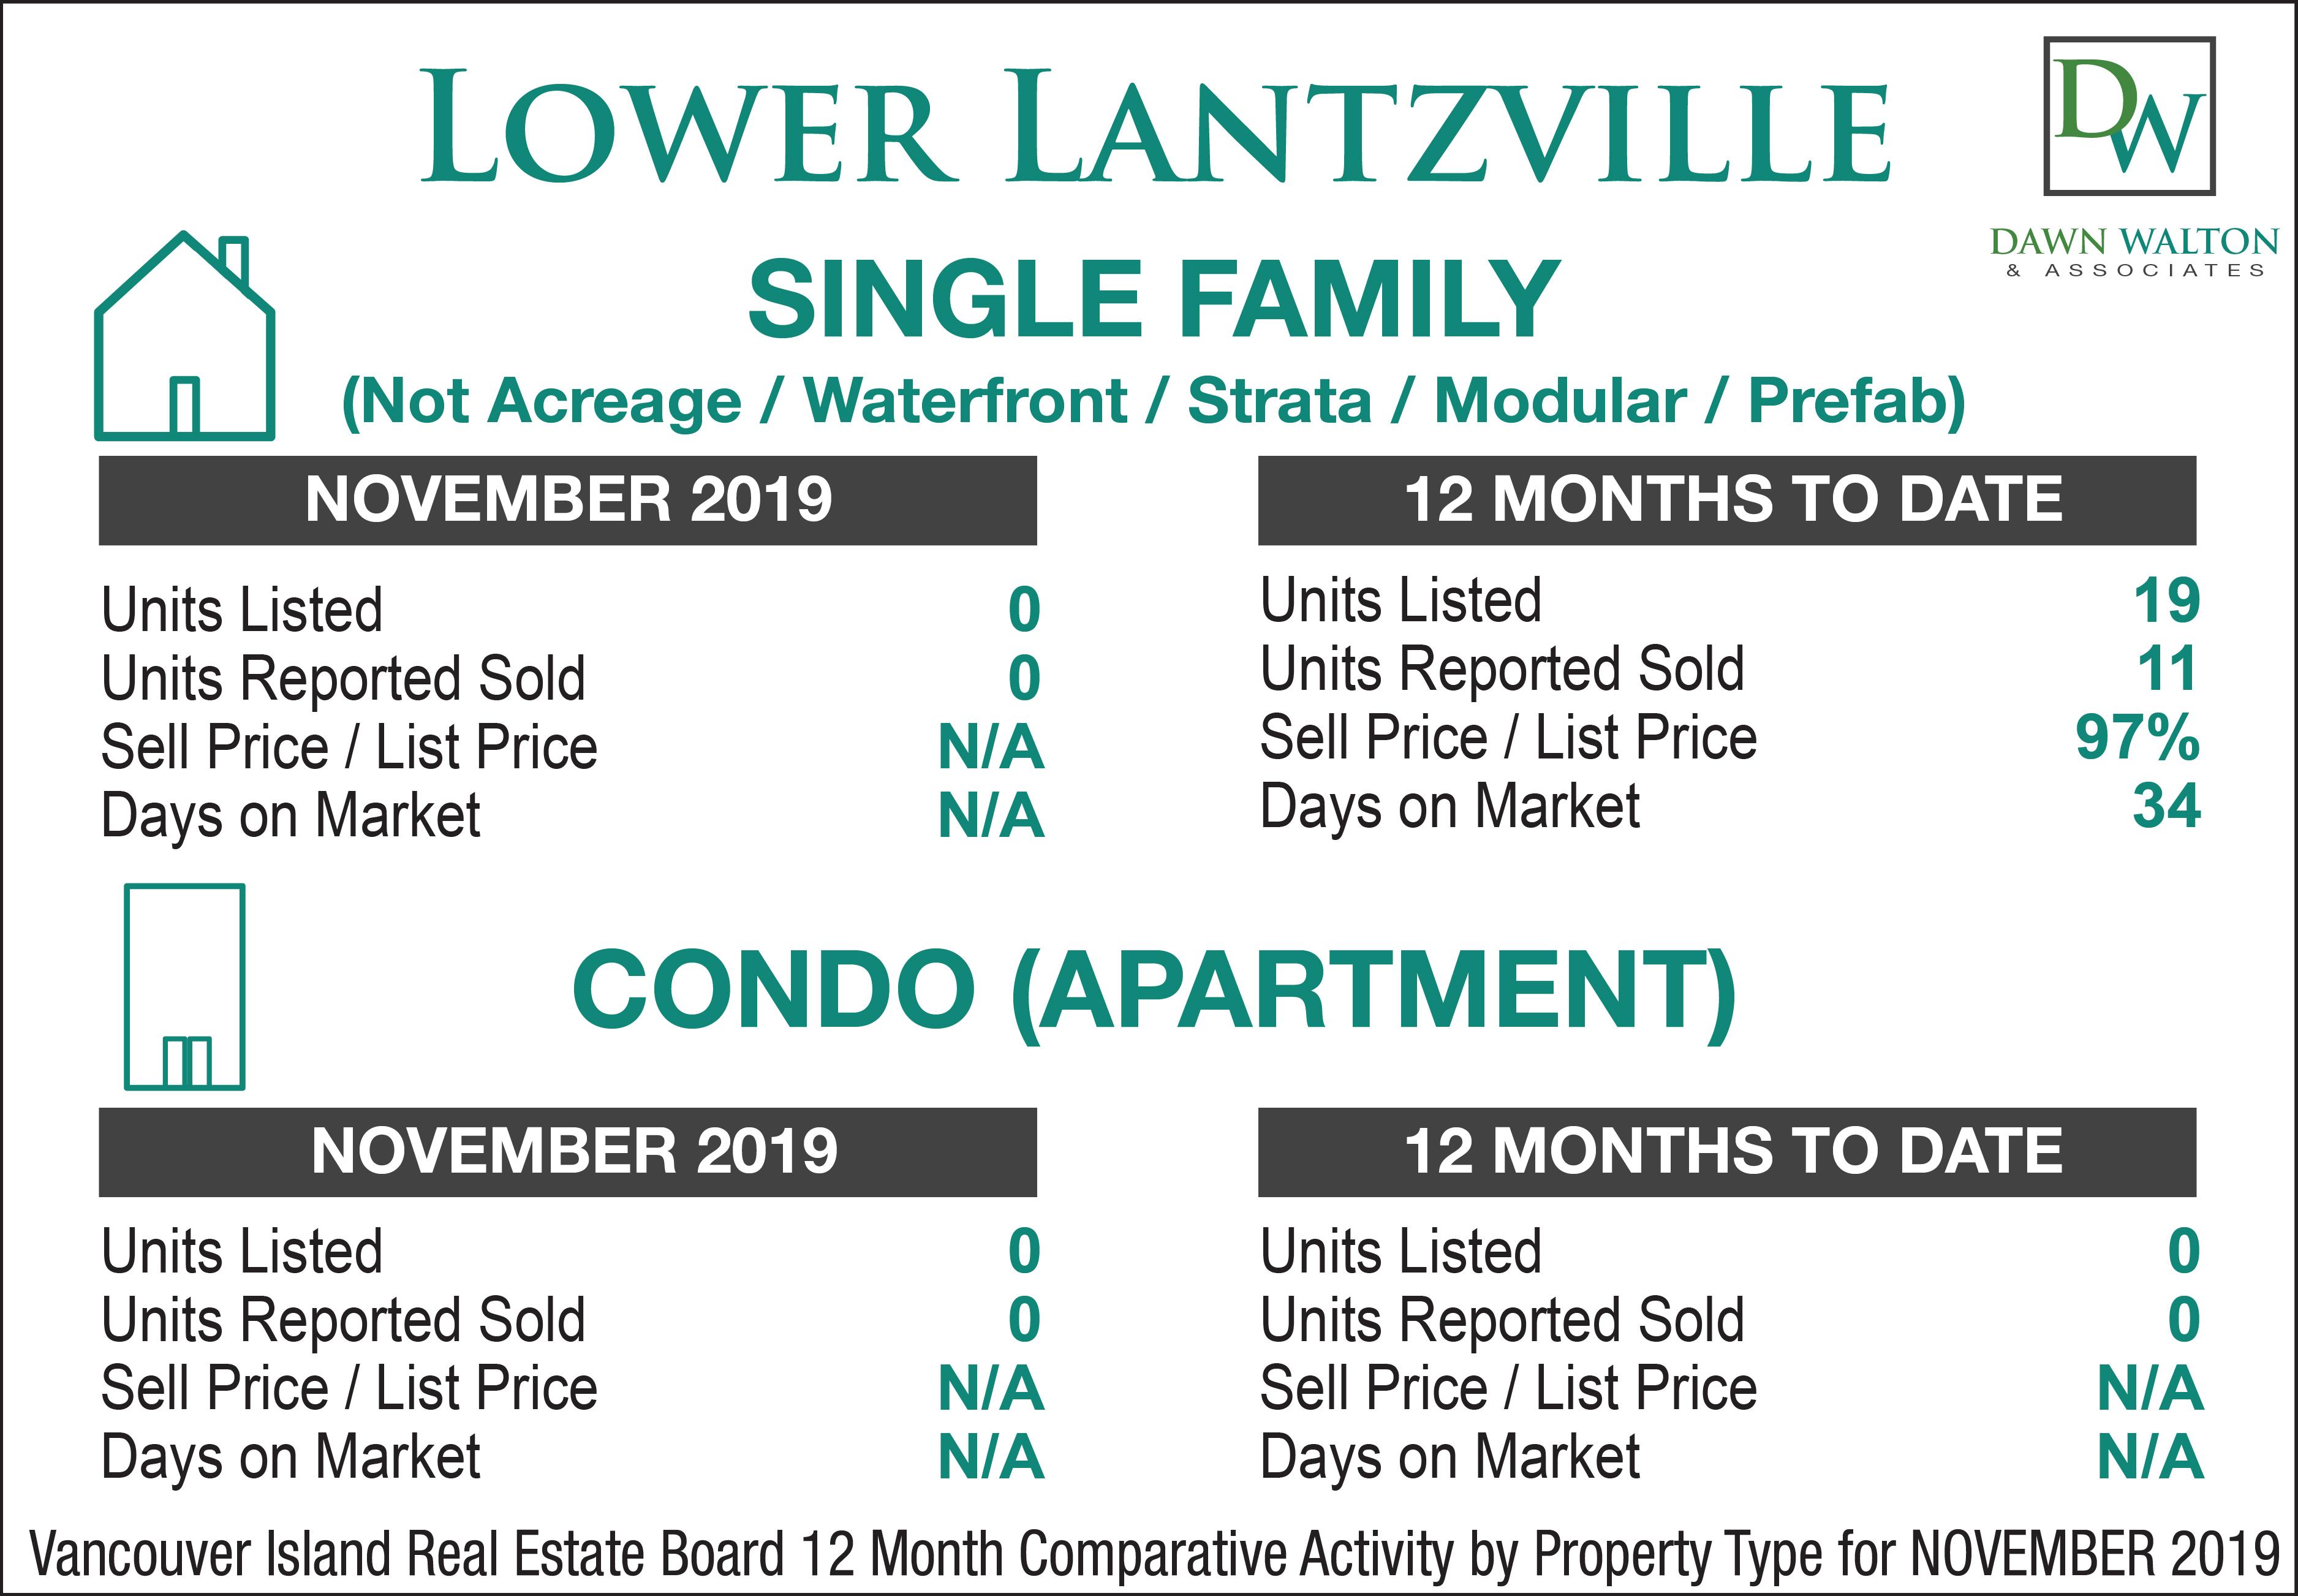 Lower Lantzville Real Estate Market Stats November  2019 - Nanaimo Realtor Dawn Walton